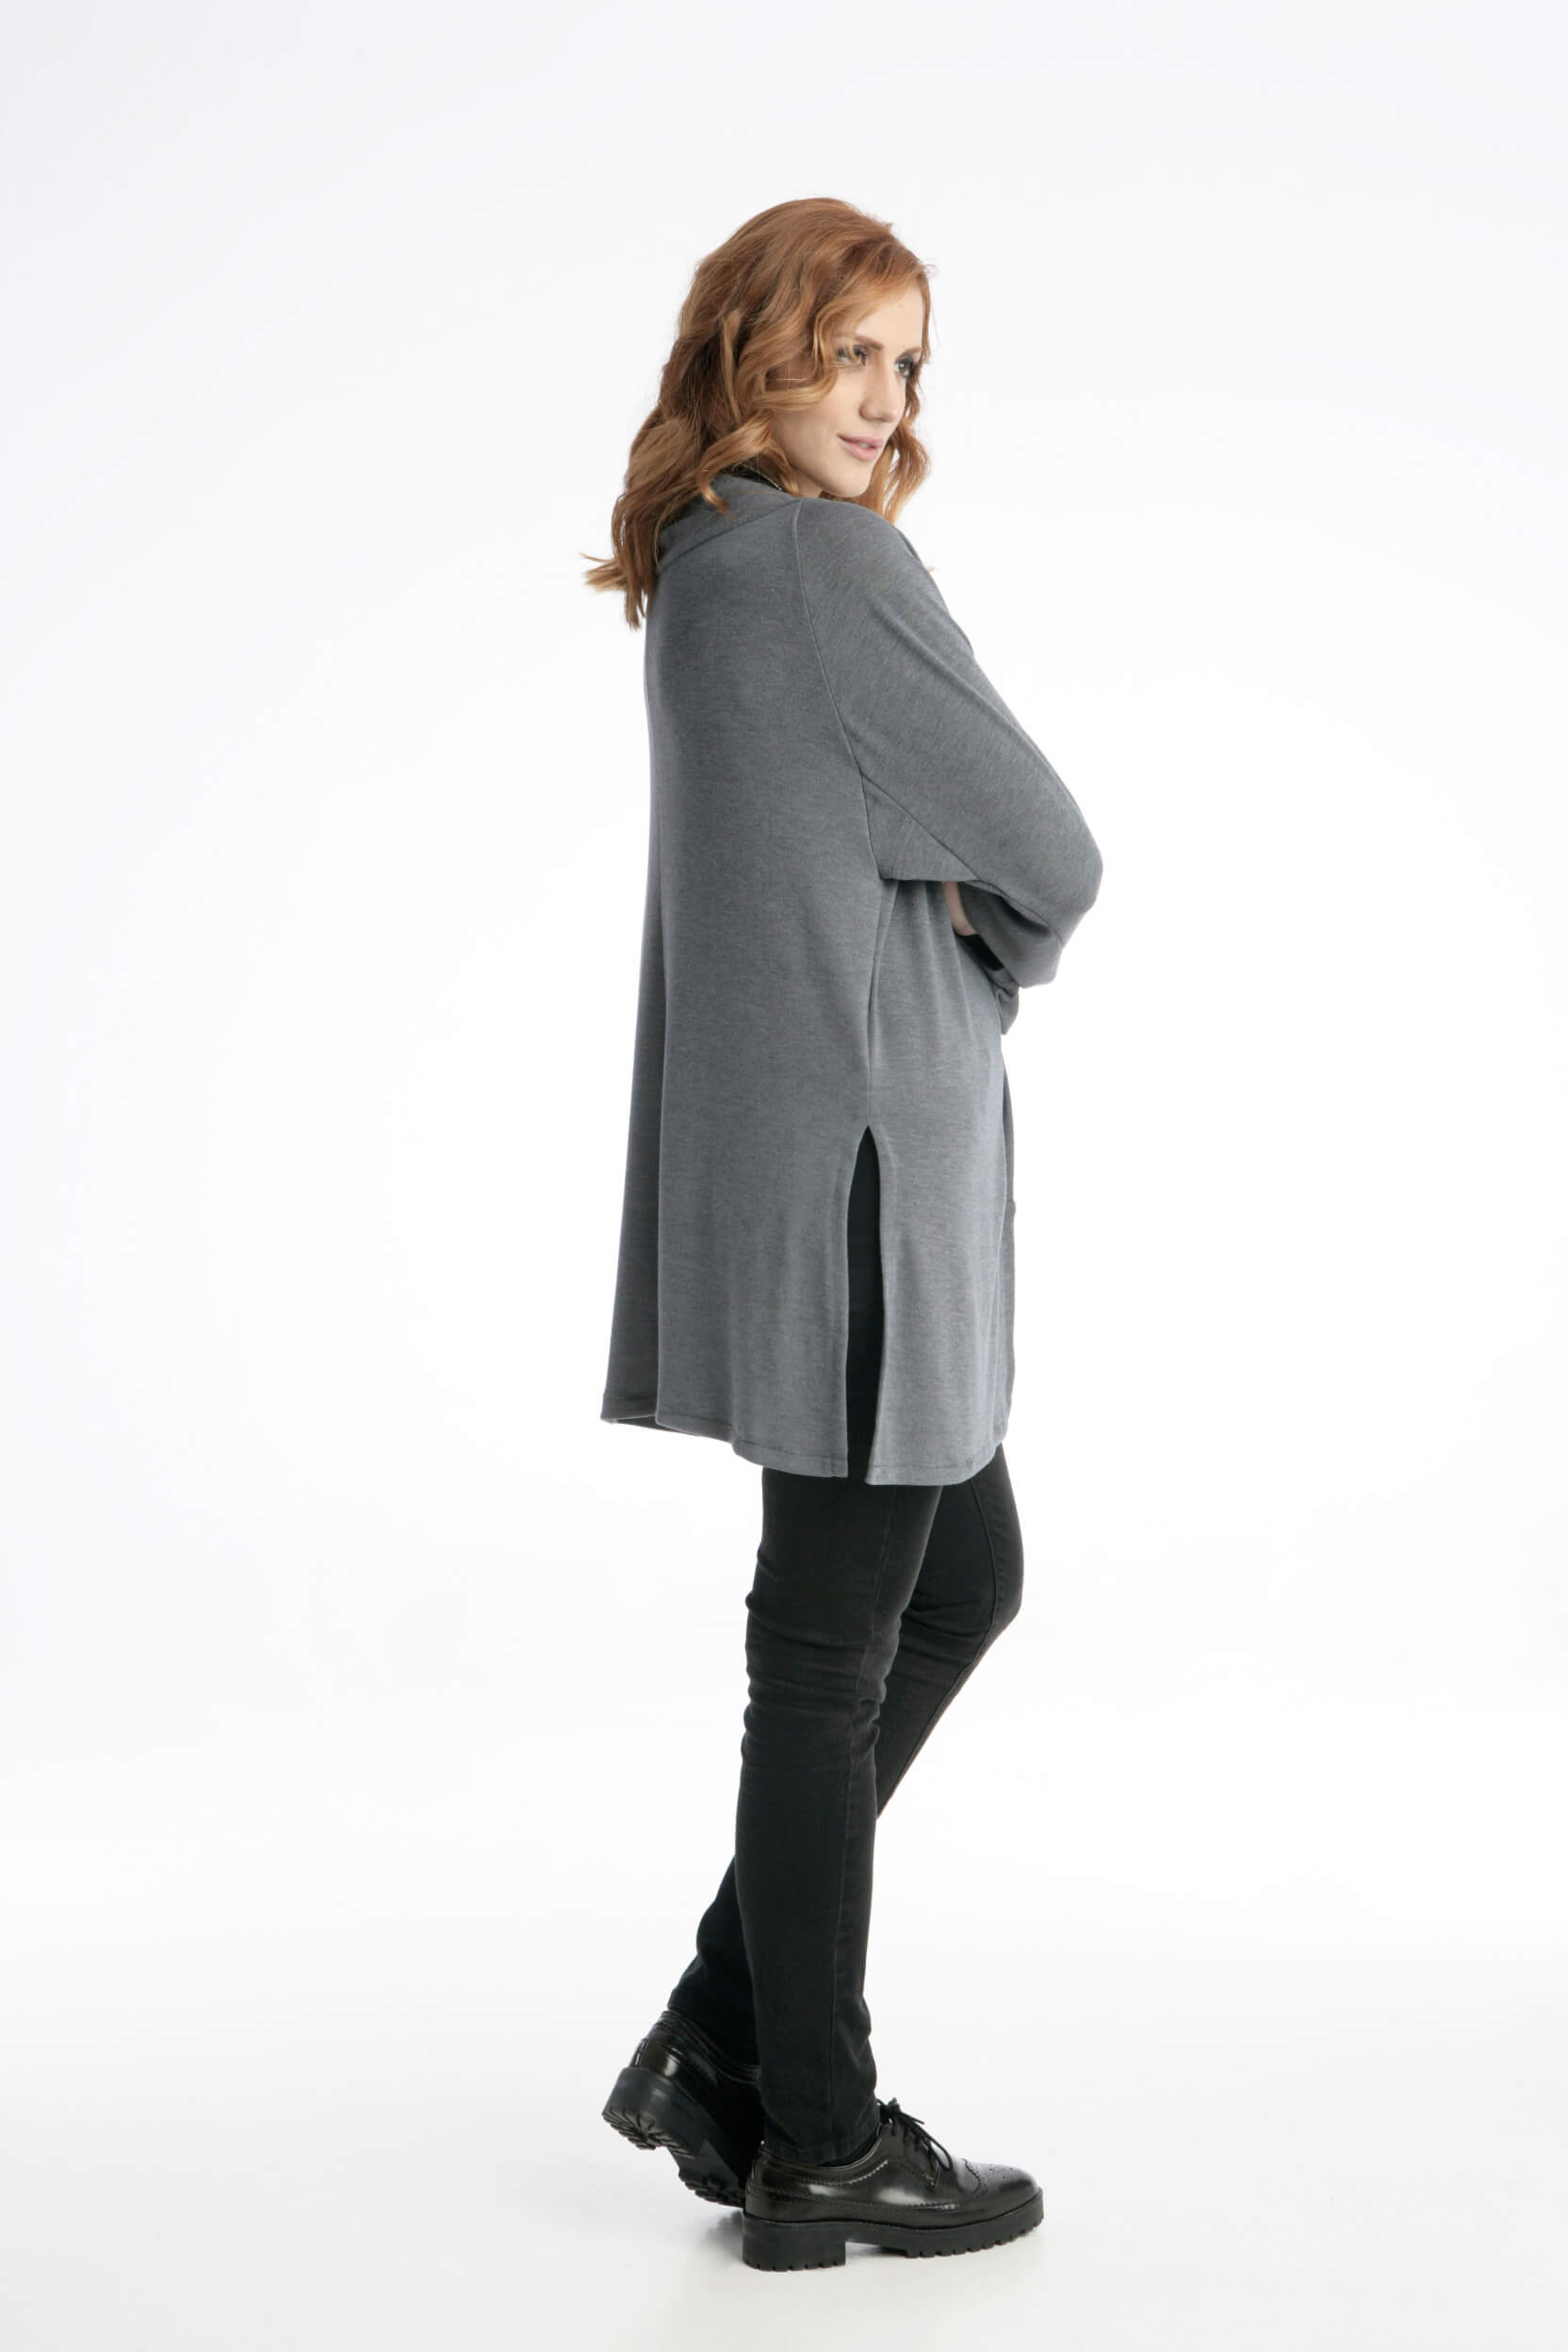 9c7e6aa16d3b Γυναικεία πλεχτή ζακέτα - Prestige Fashion